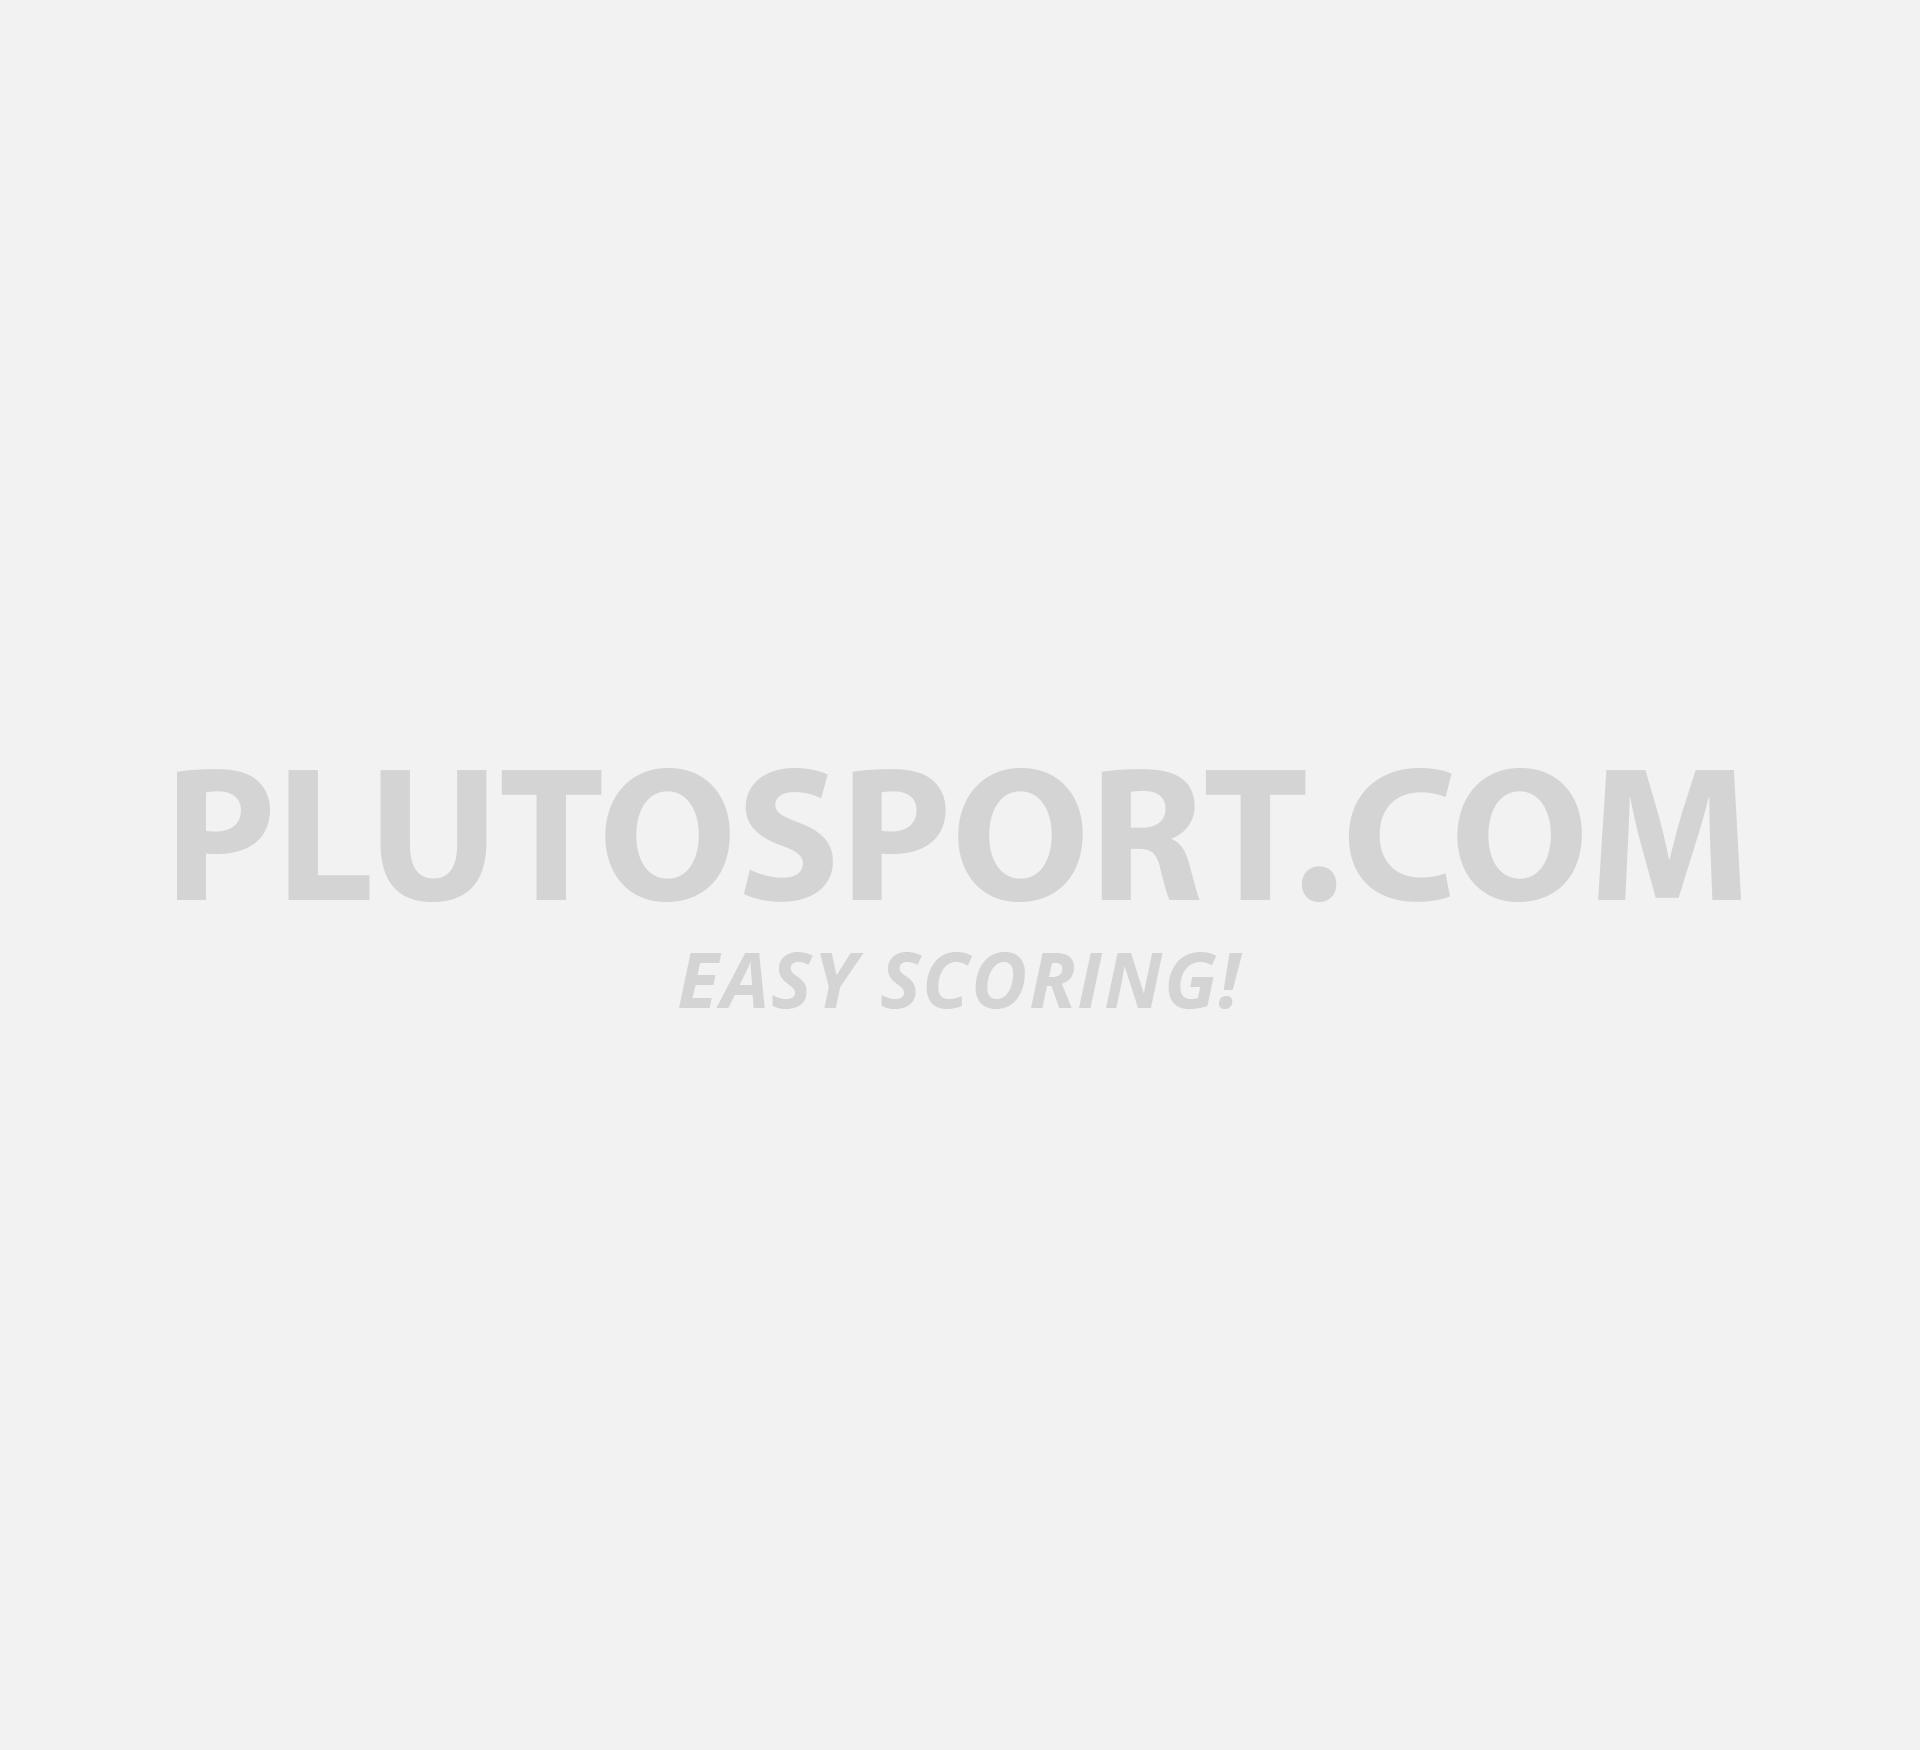 Hugo Boss Brief Boxershorts Men (3-pack)